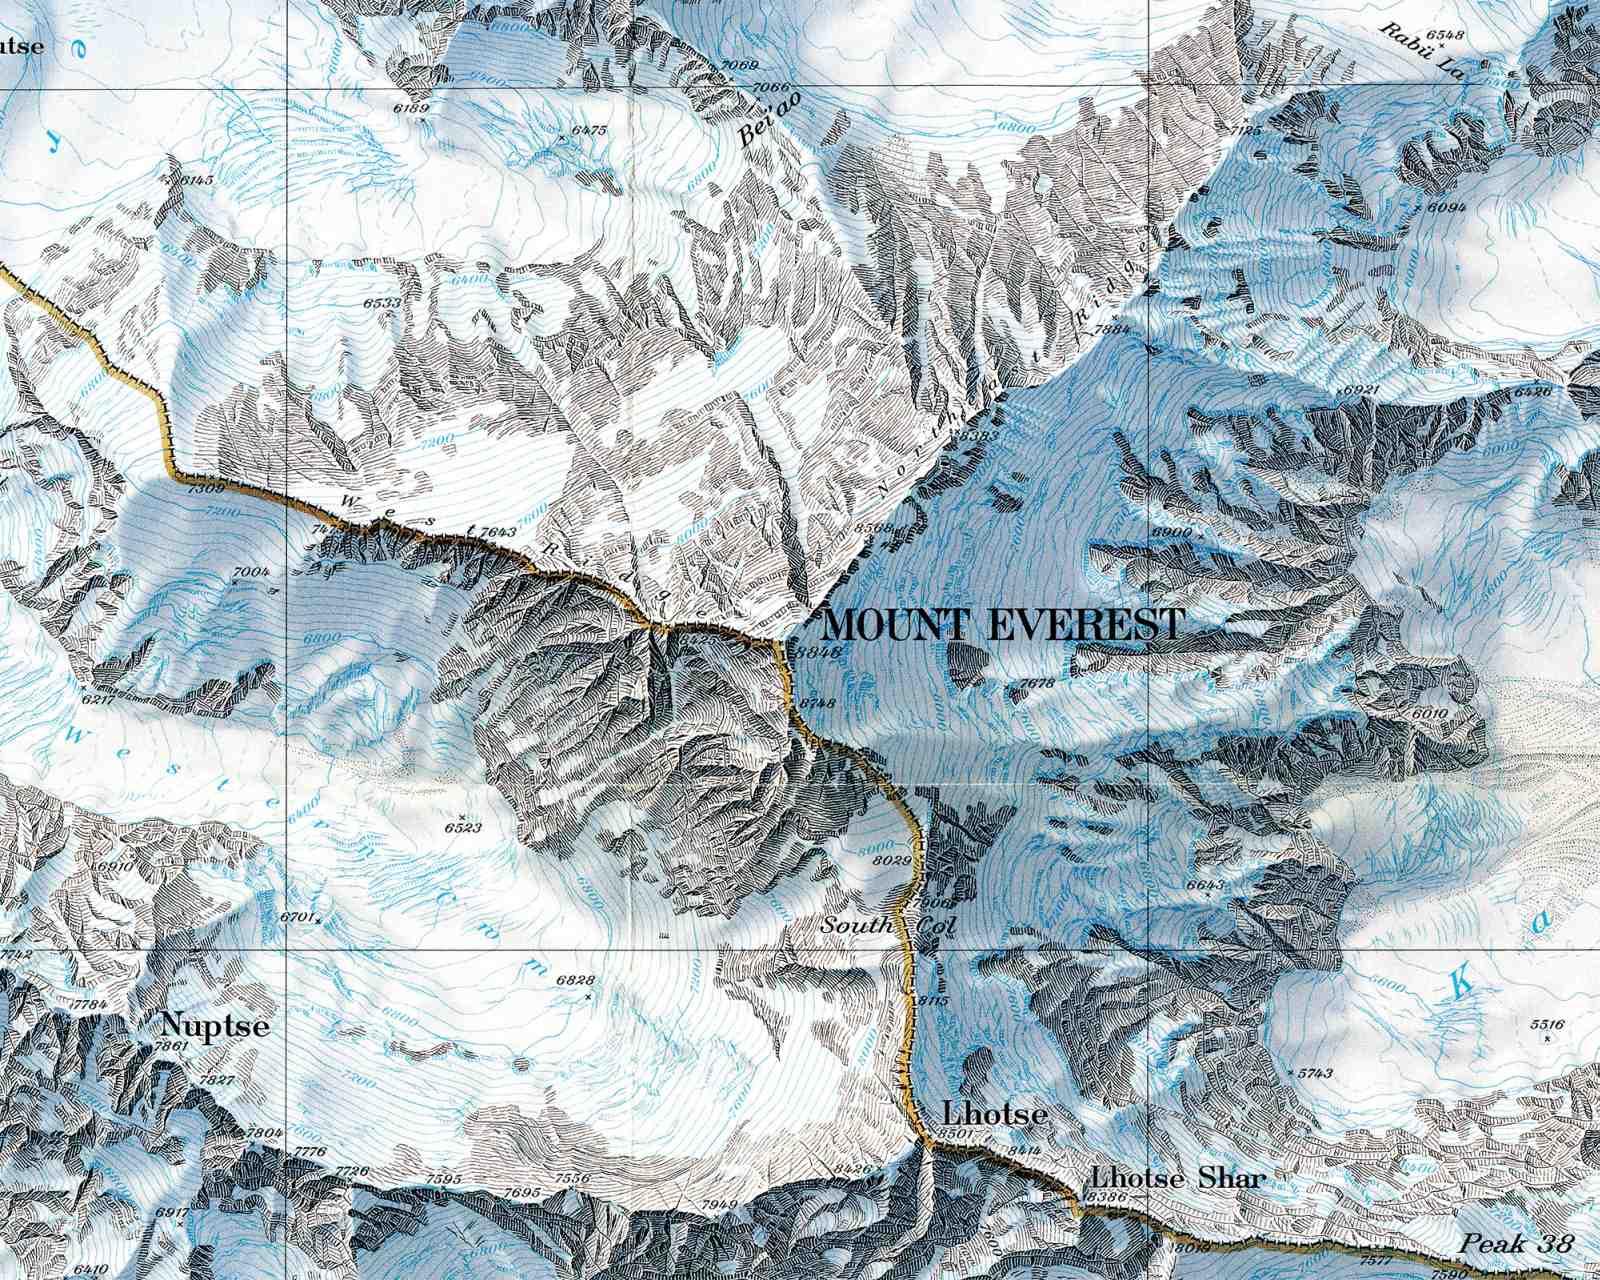 Ice Fall Wallpaper Online Maps Mount Everest Maps